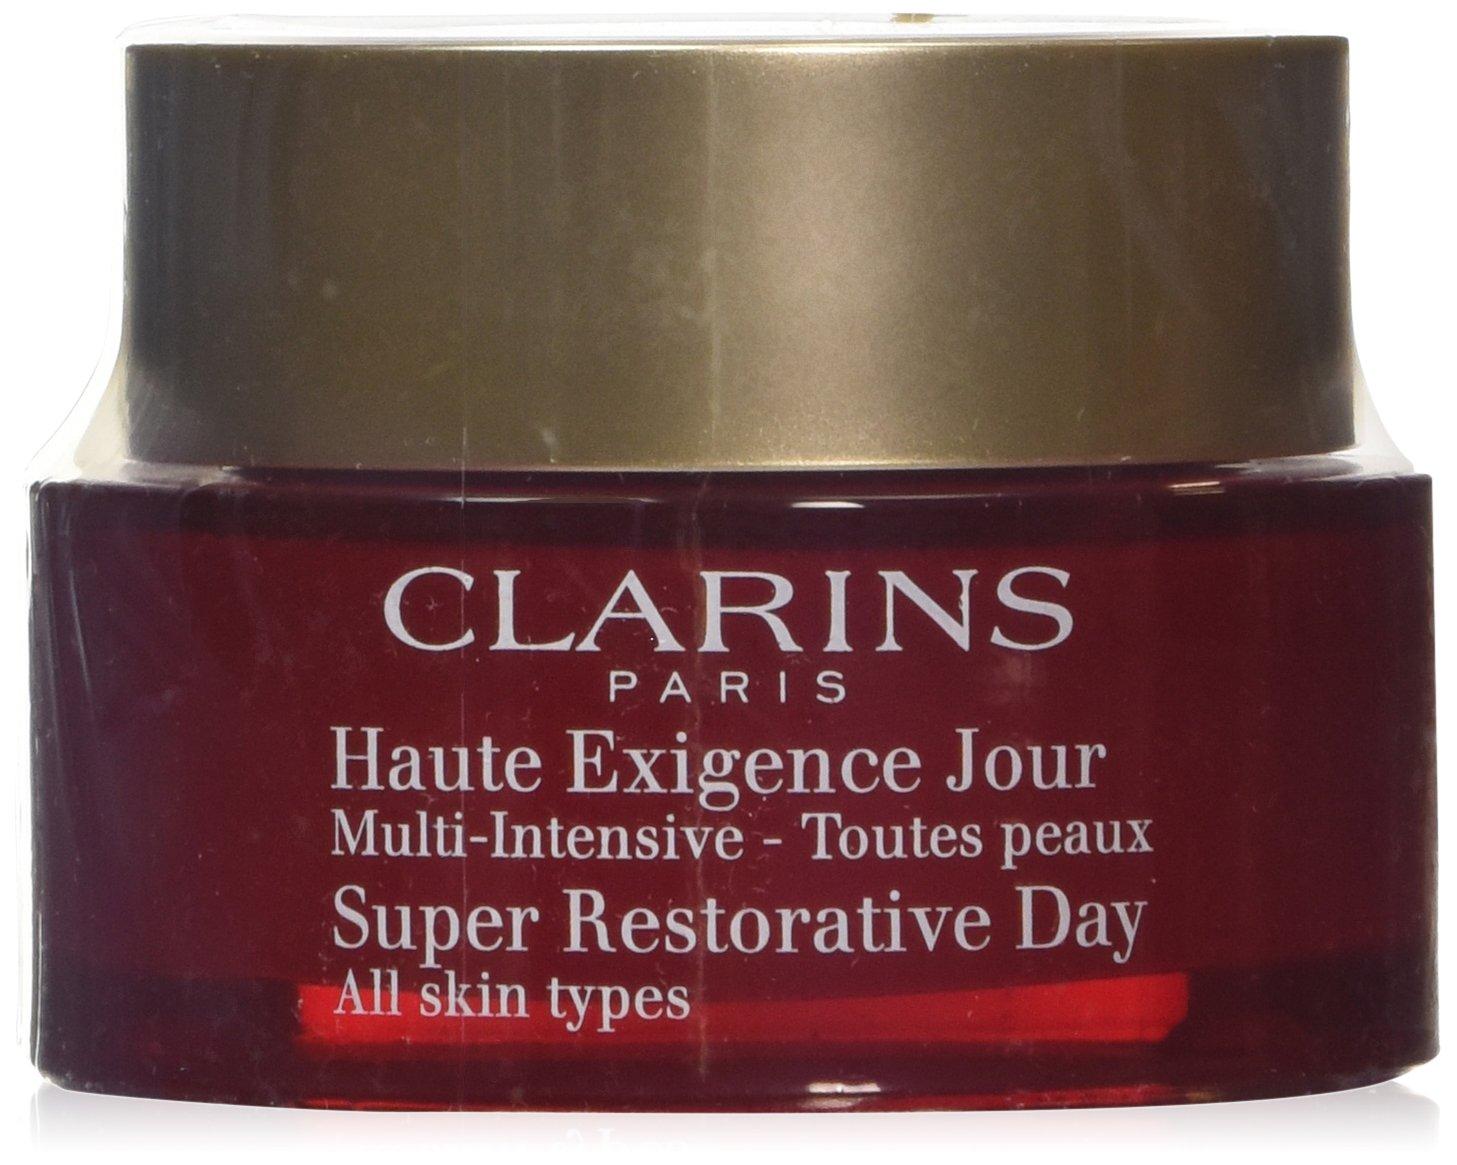 Clarins Super Restorative Day 1.7 Oz Cream